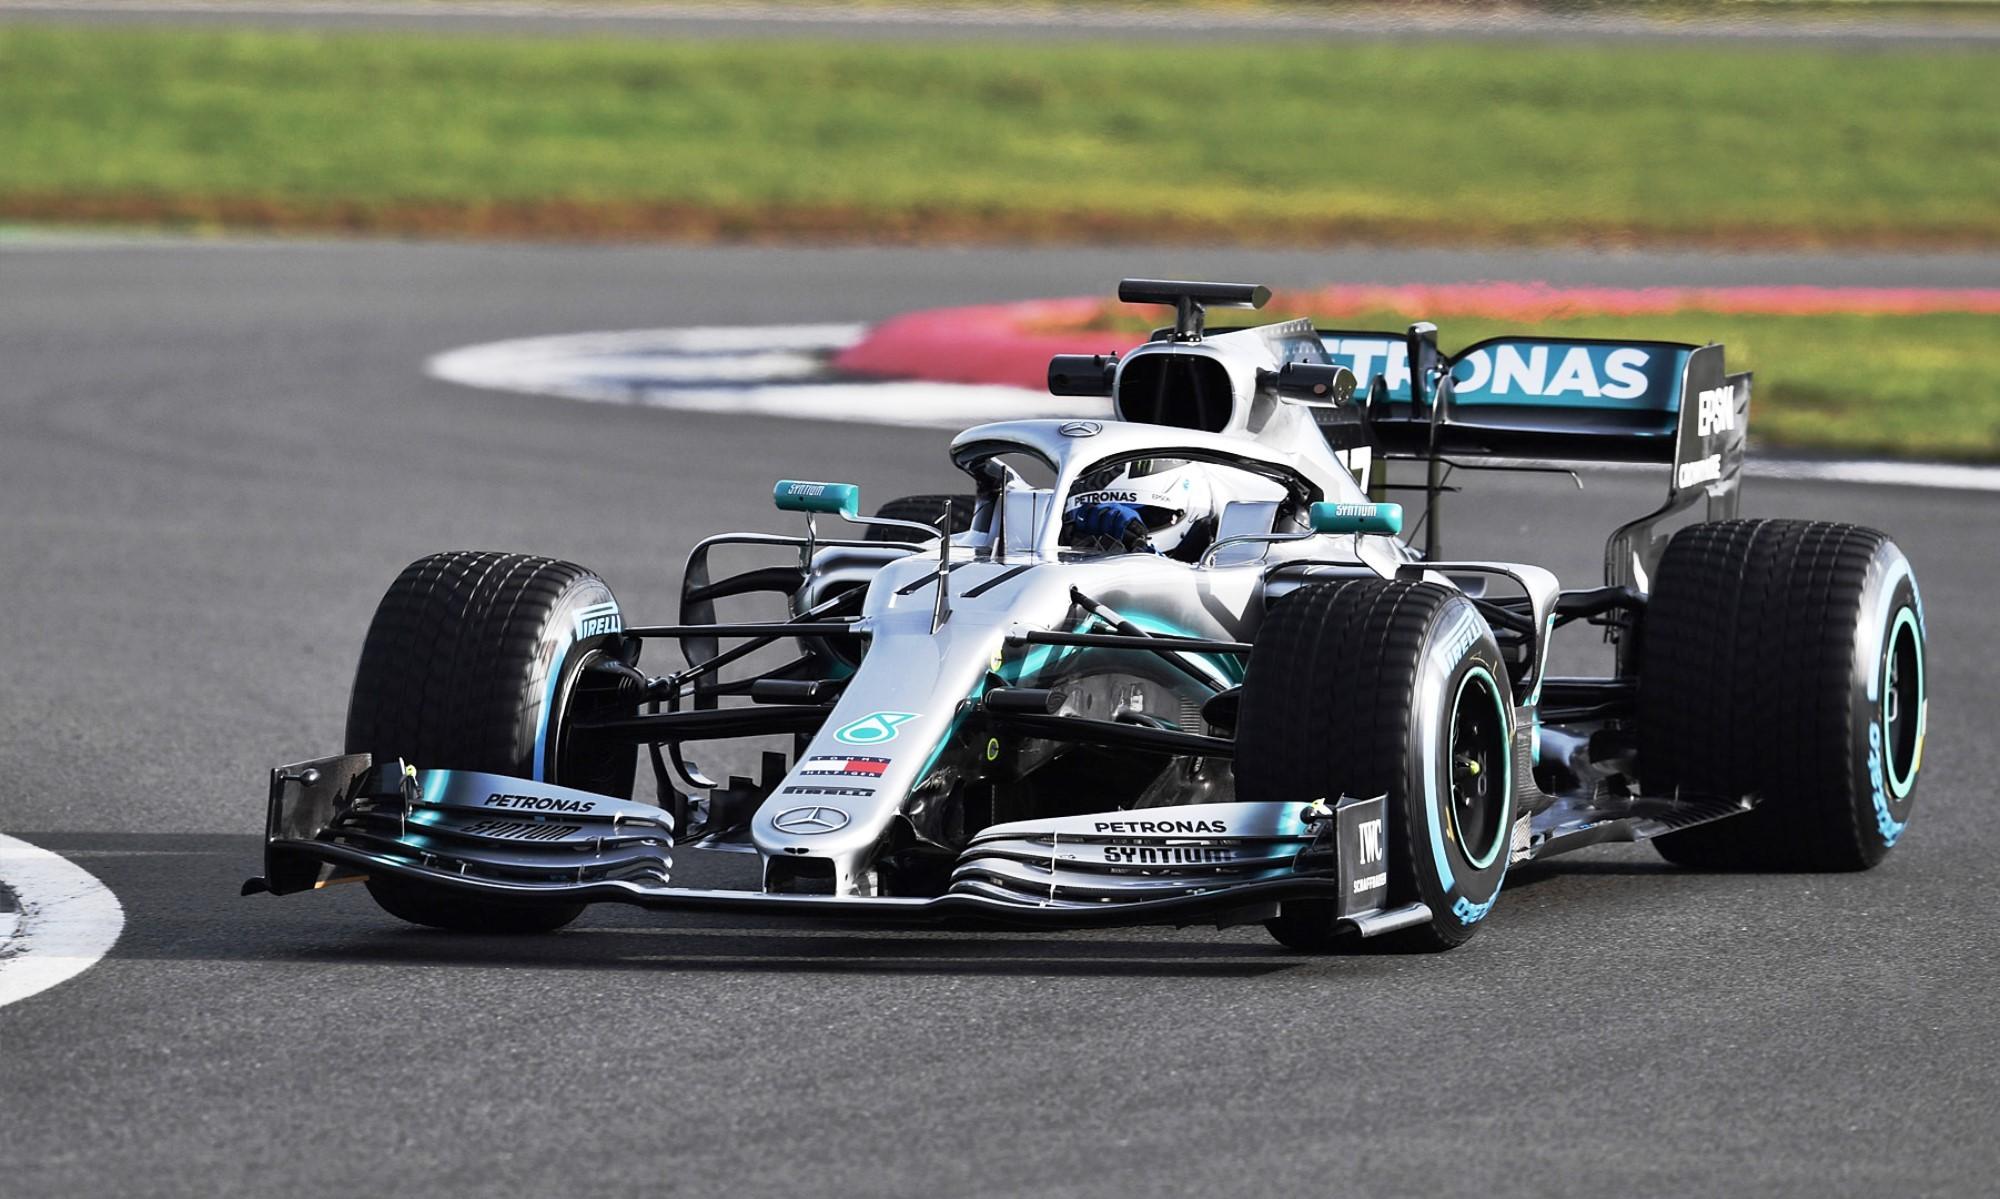 Mercedes W10 in F1 testing 2019